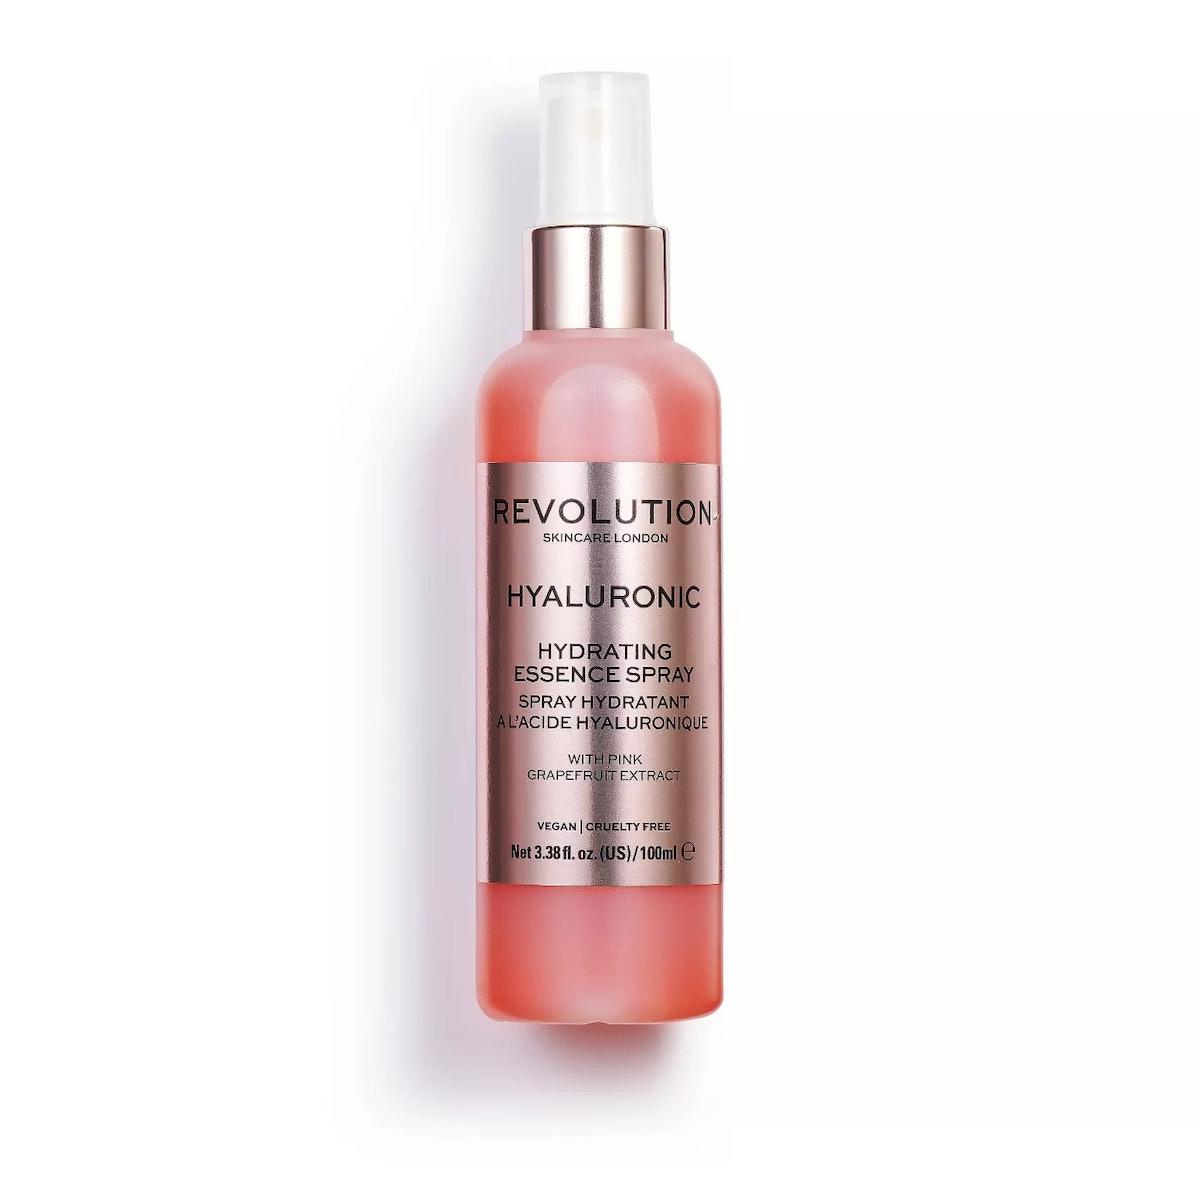 Skincare Hyaluronic Essence Spray